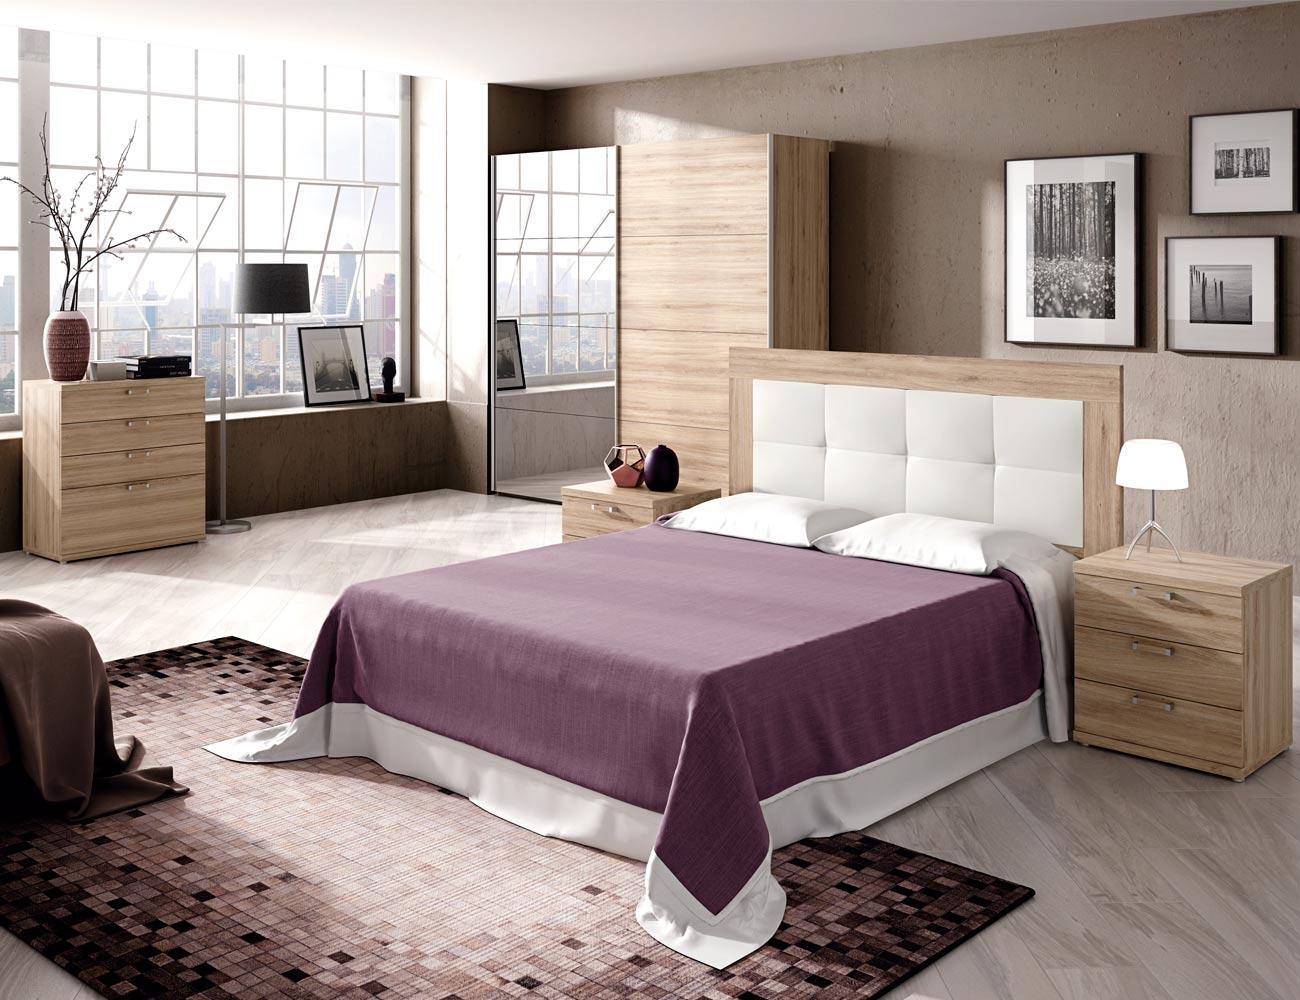 467 dormitorio matrimonio cabecero tapizado comoda armario roble